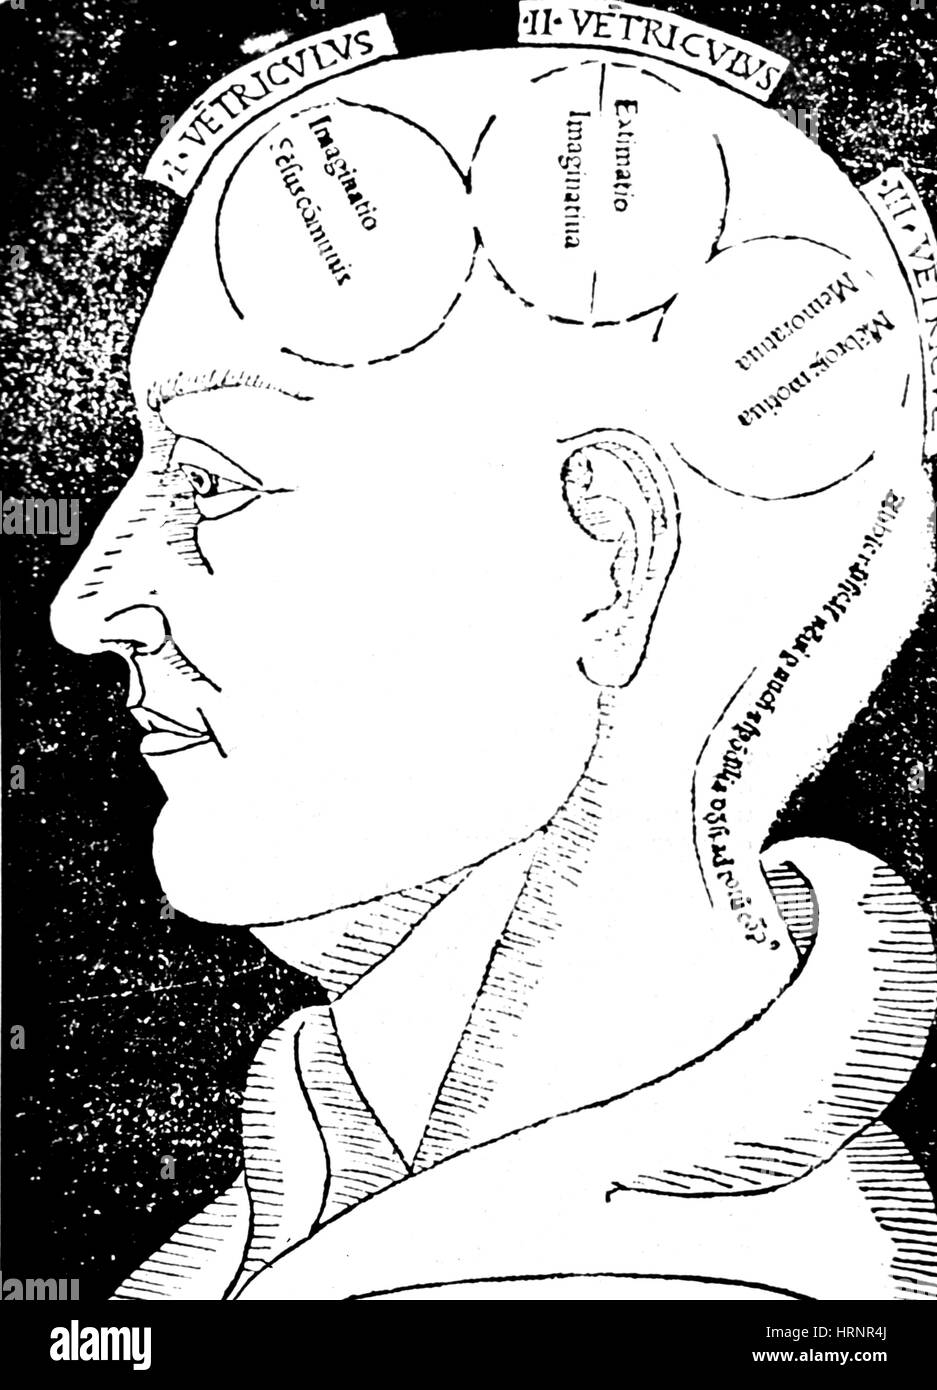 Gehirn Sie-Funktionen, Albertus-Magnus-Holzschnitt Stockbild